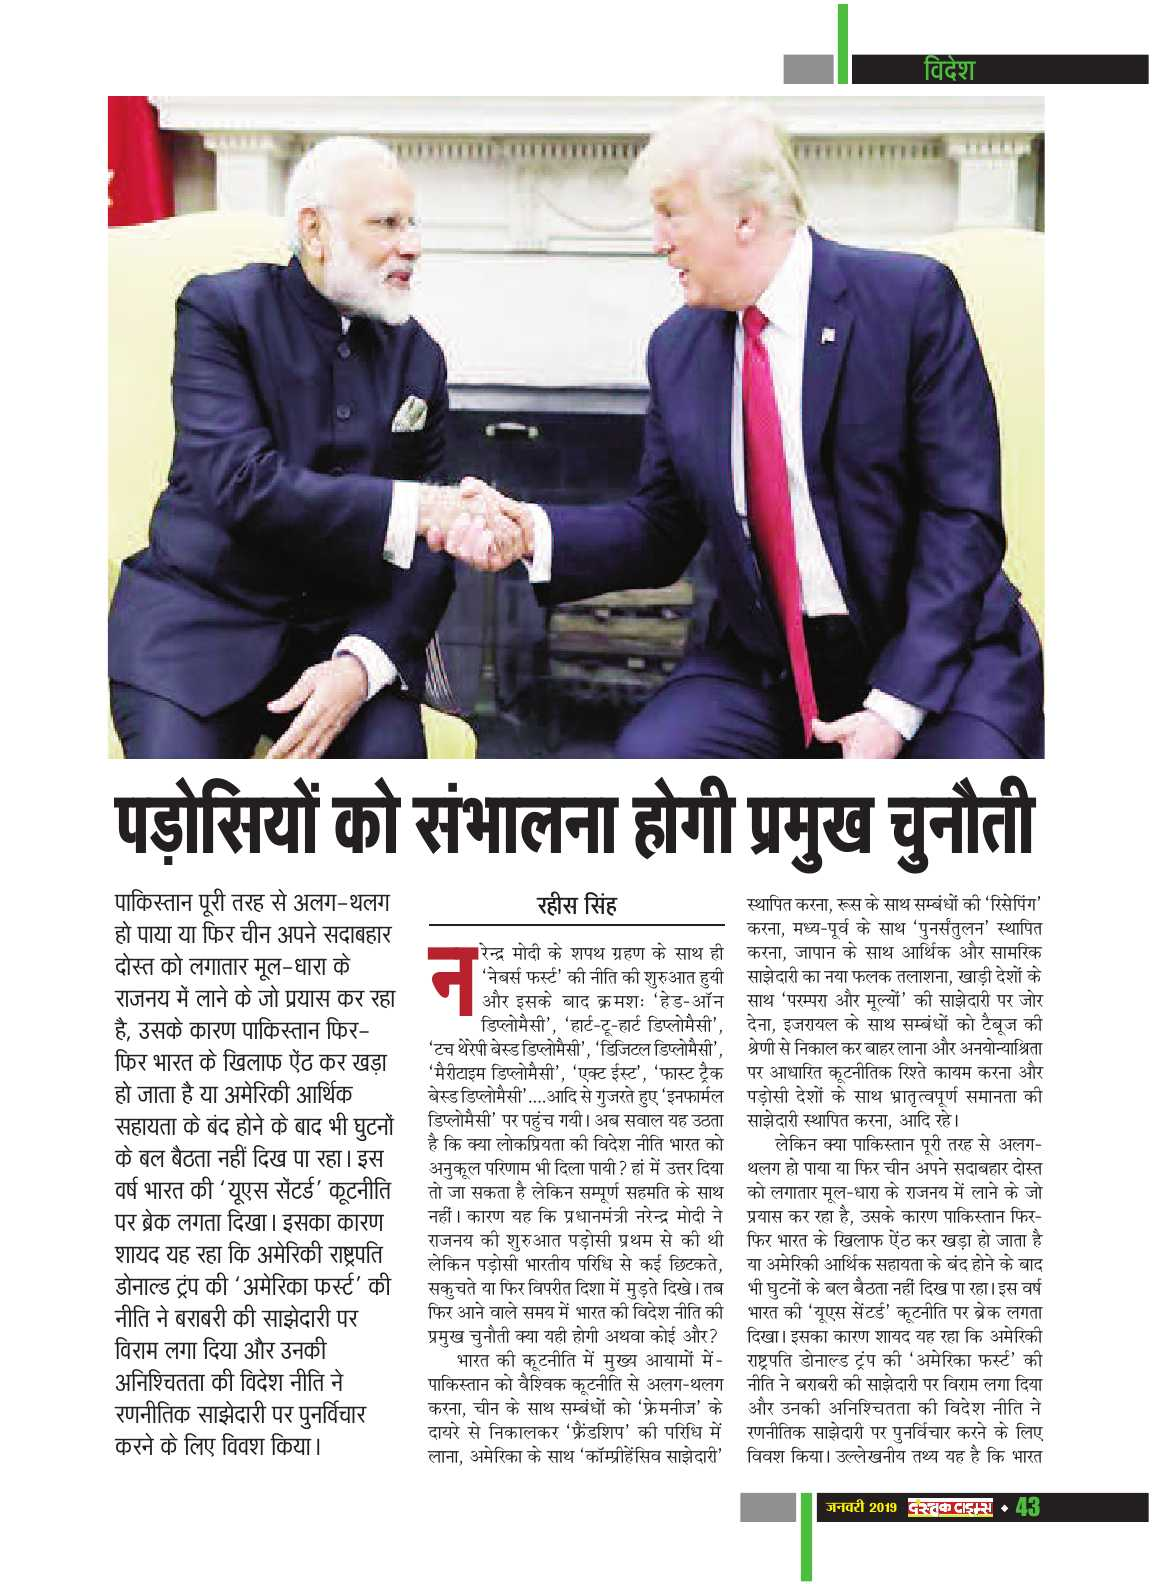 Dastak Times for E-Magazine 15 Jan 2019 new45